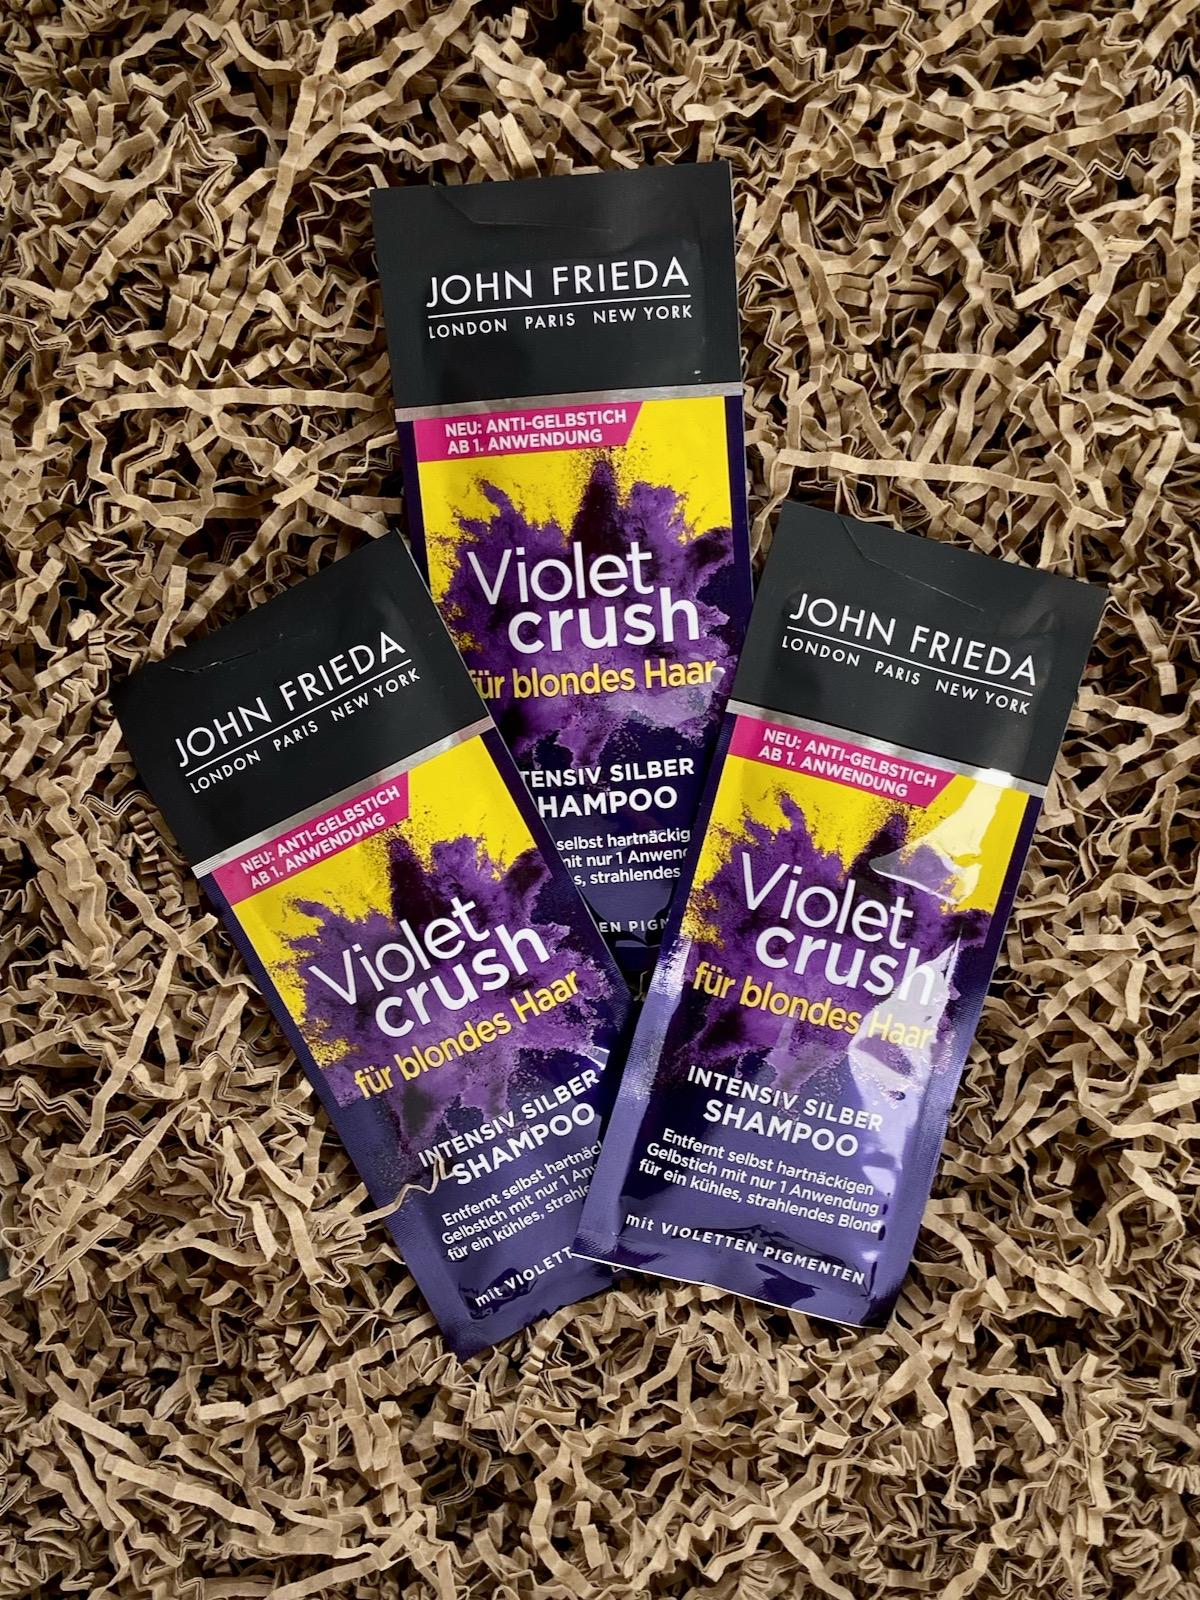 John Frieda Violet Crush Intensiv Silber Shampoo